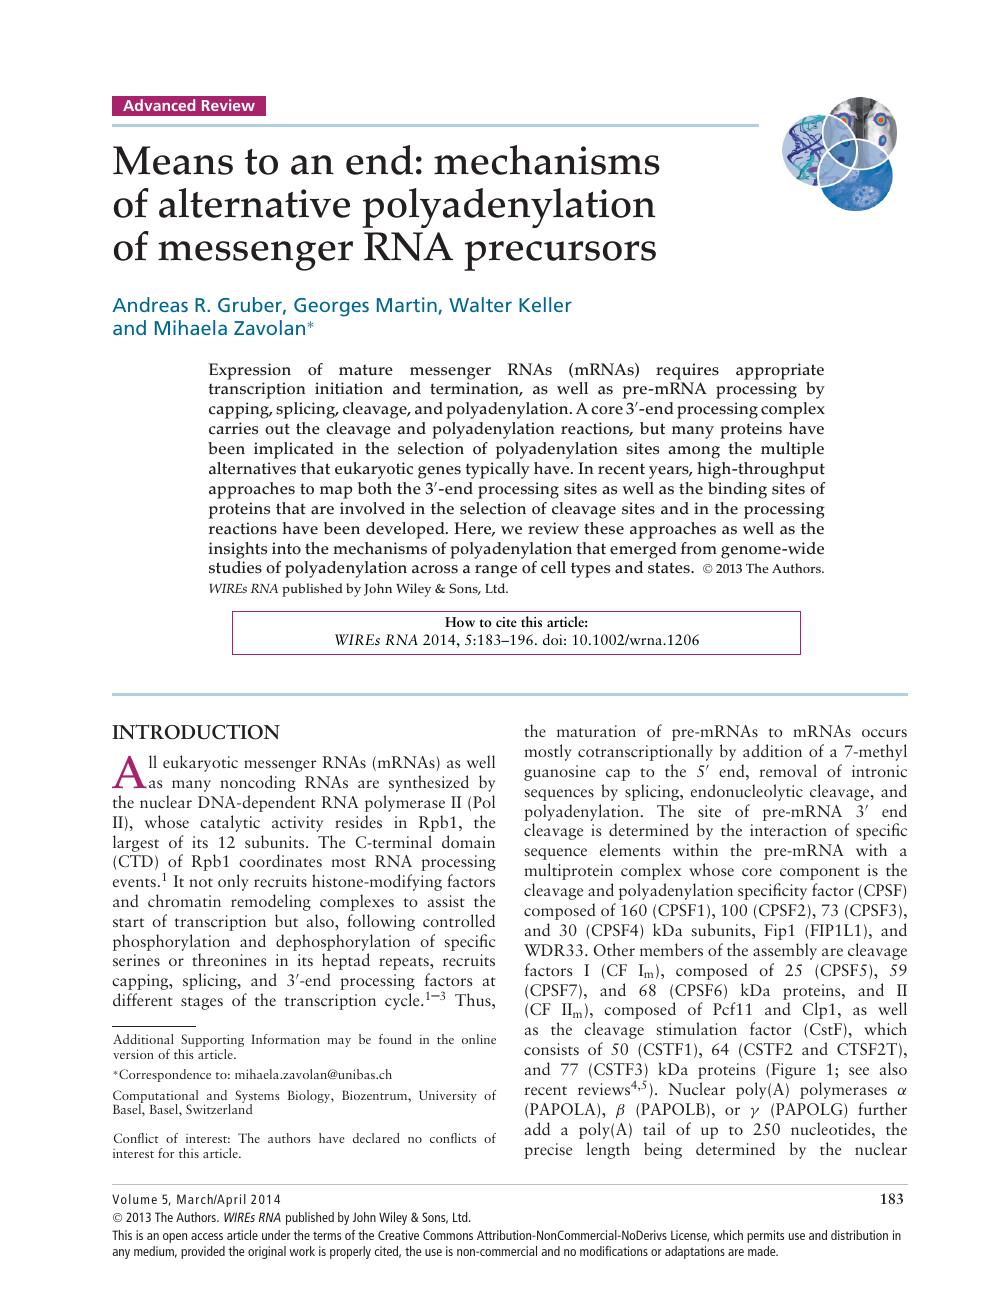 Means to an end: mechanisms of alternative polyadenylation